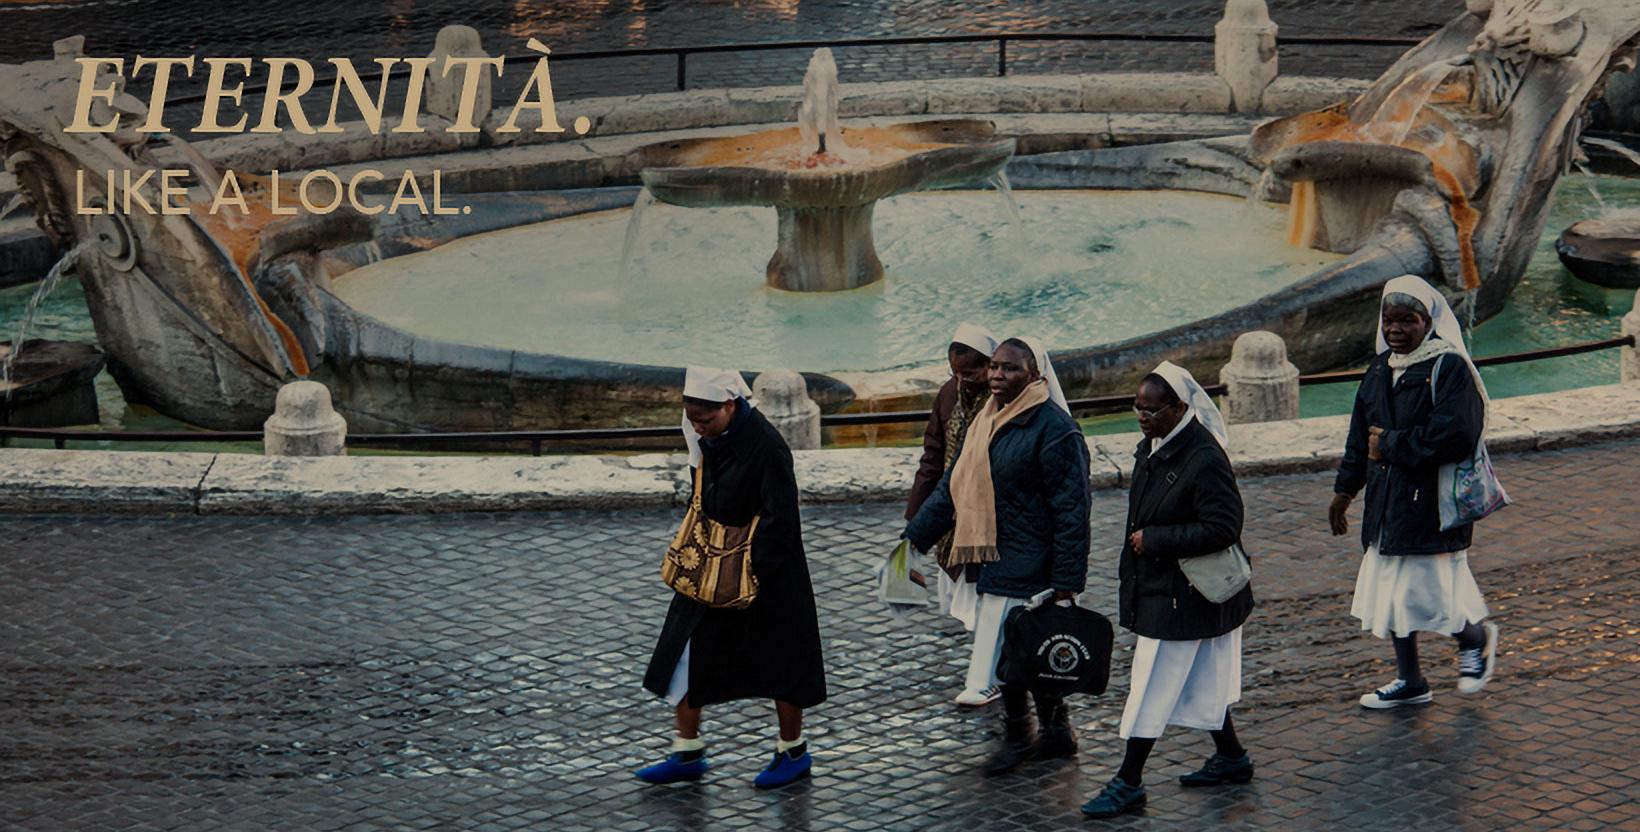 https://localike-roma.com/wp-content/uploads/2020/10/localike-roma-eternita-Fontana-della-Barcaccia-aspect-ratio-1640-832.jpg